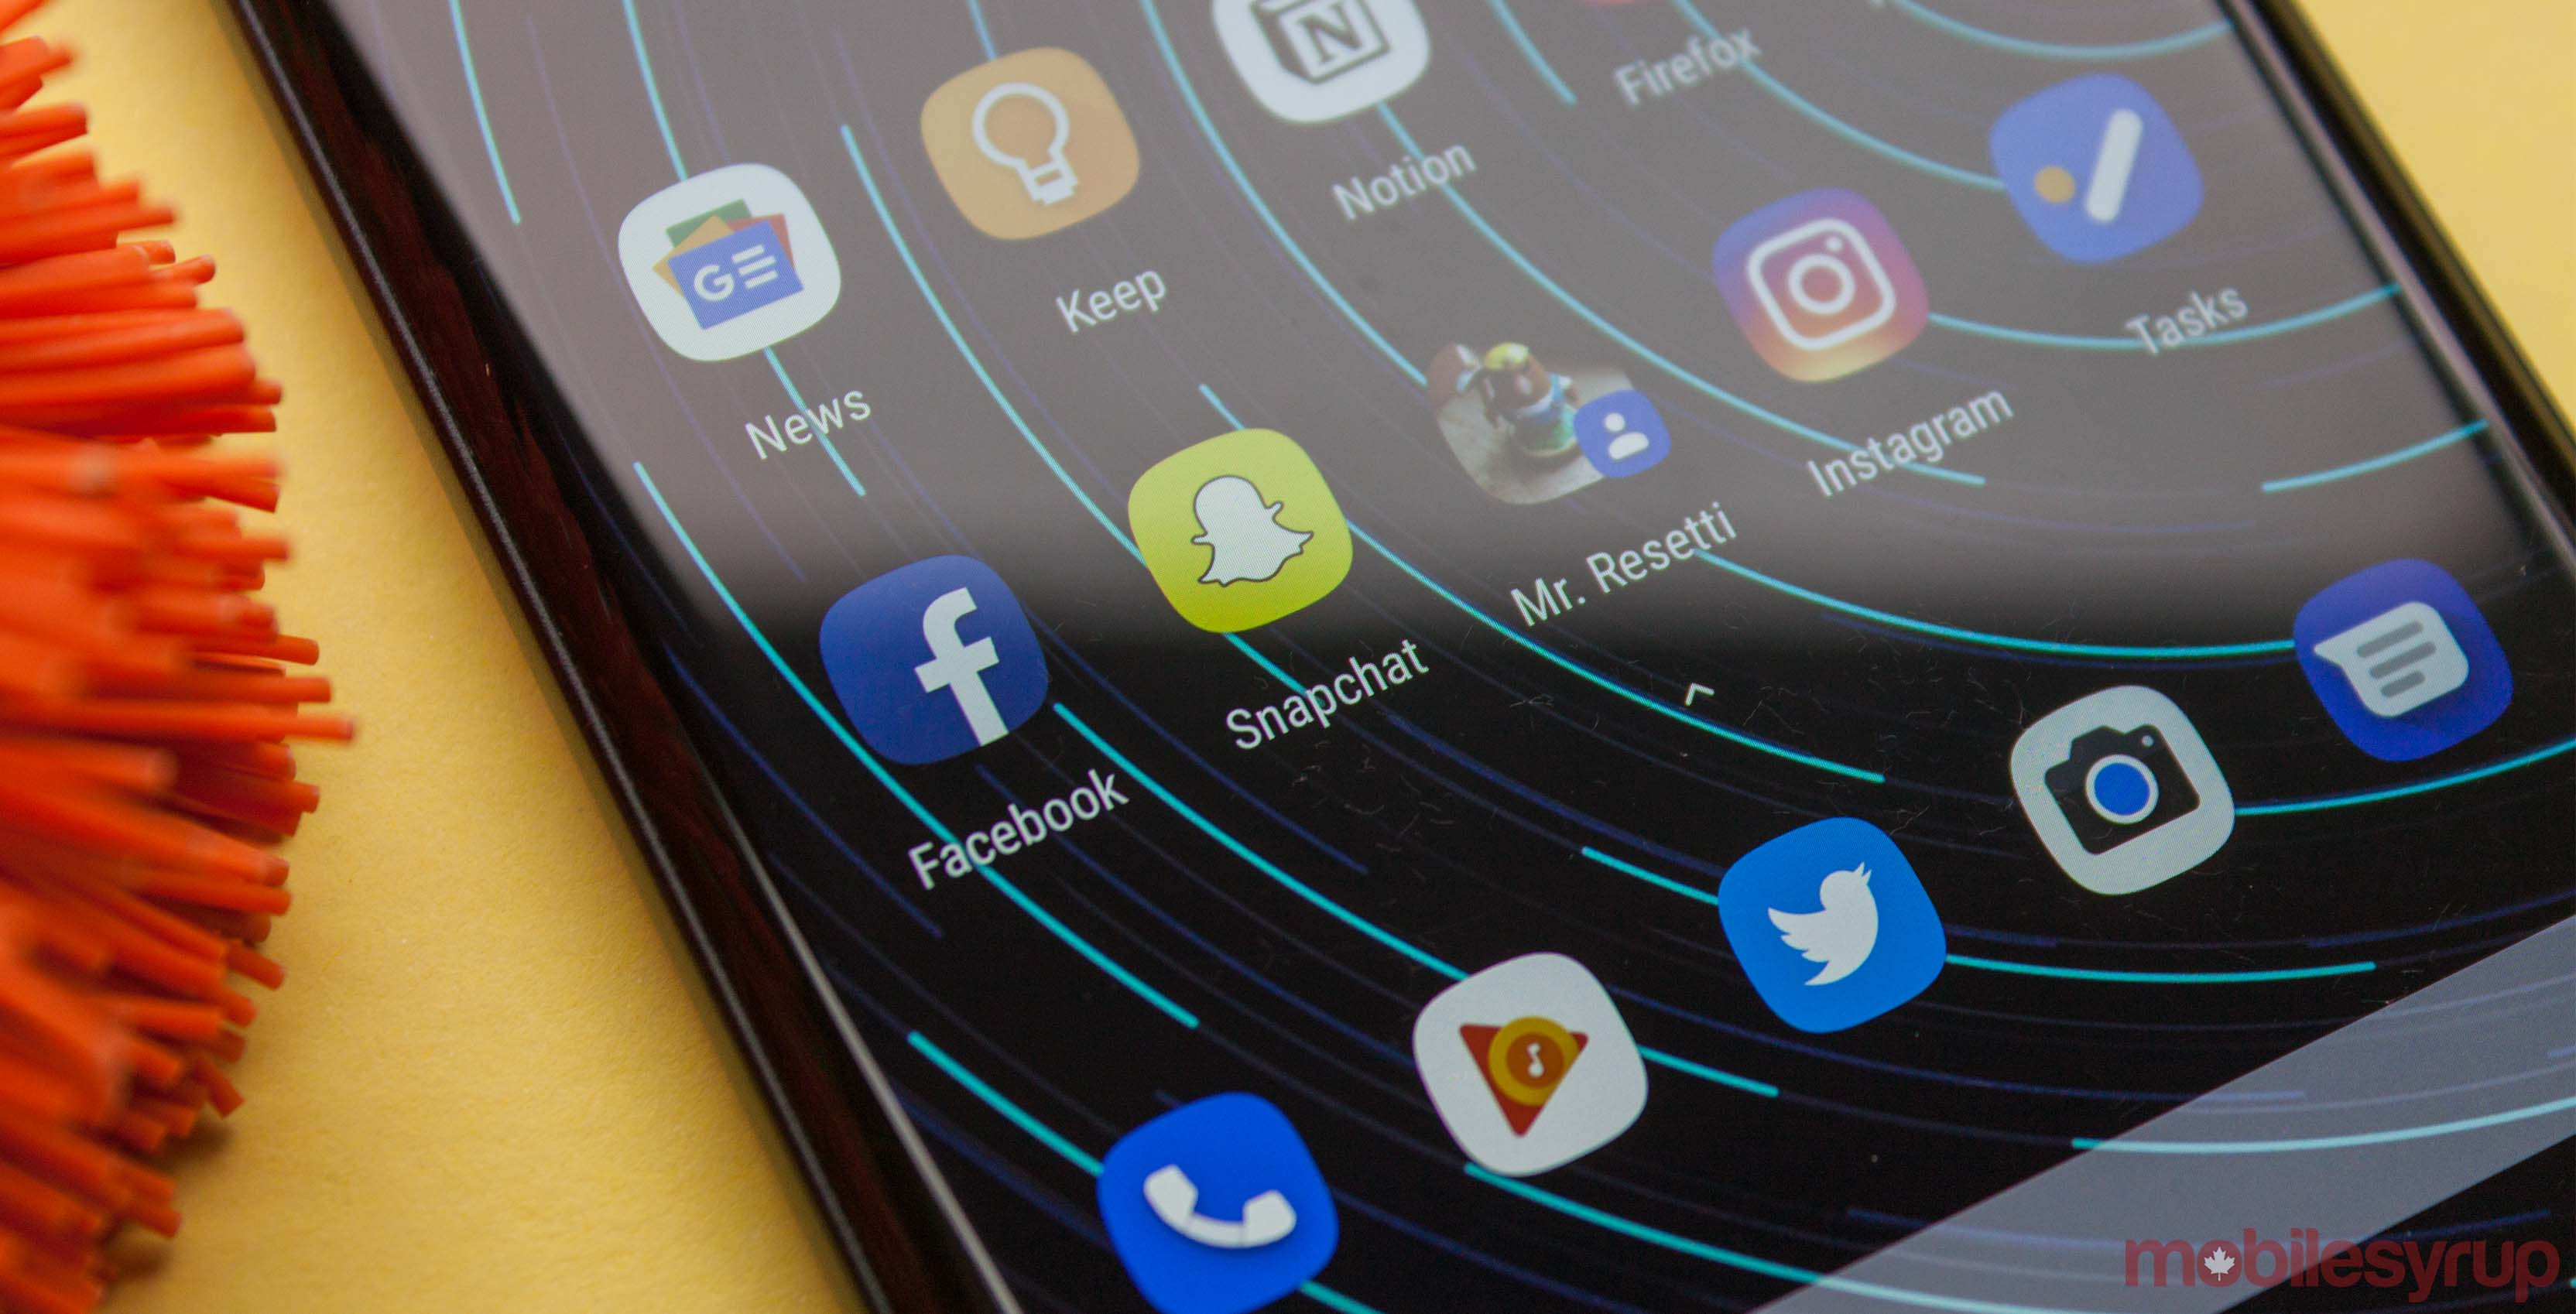 Snapchat adaptive icon